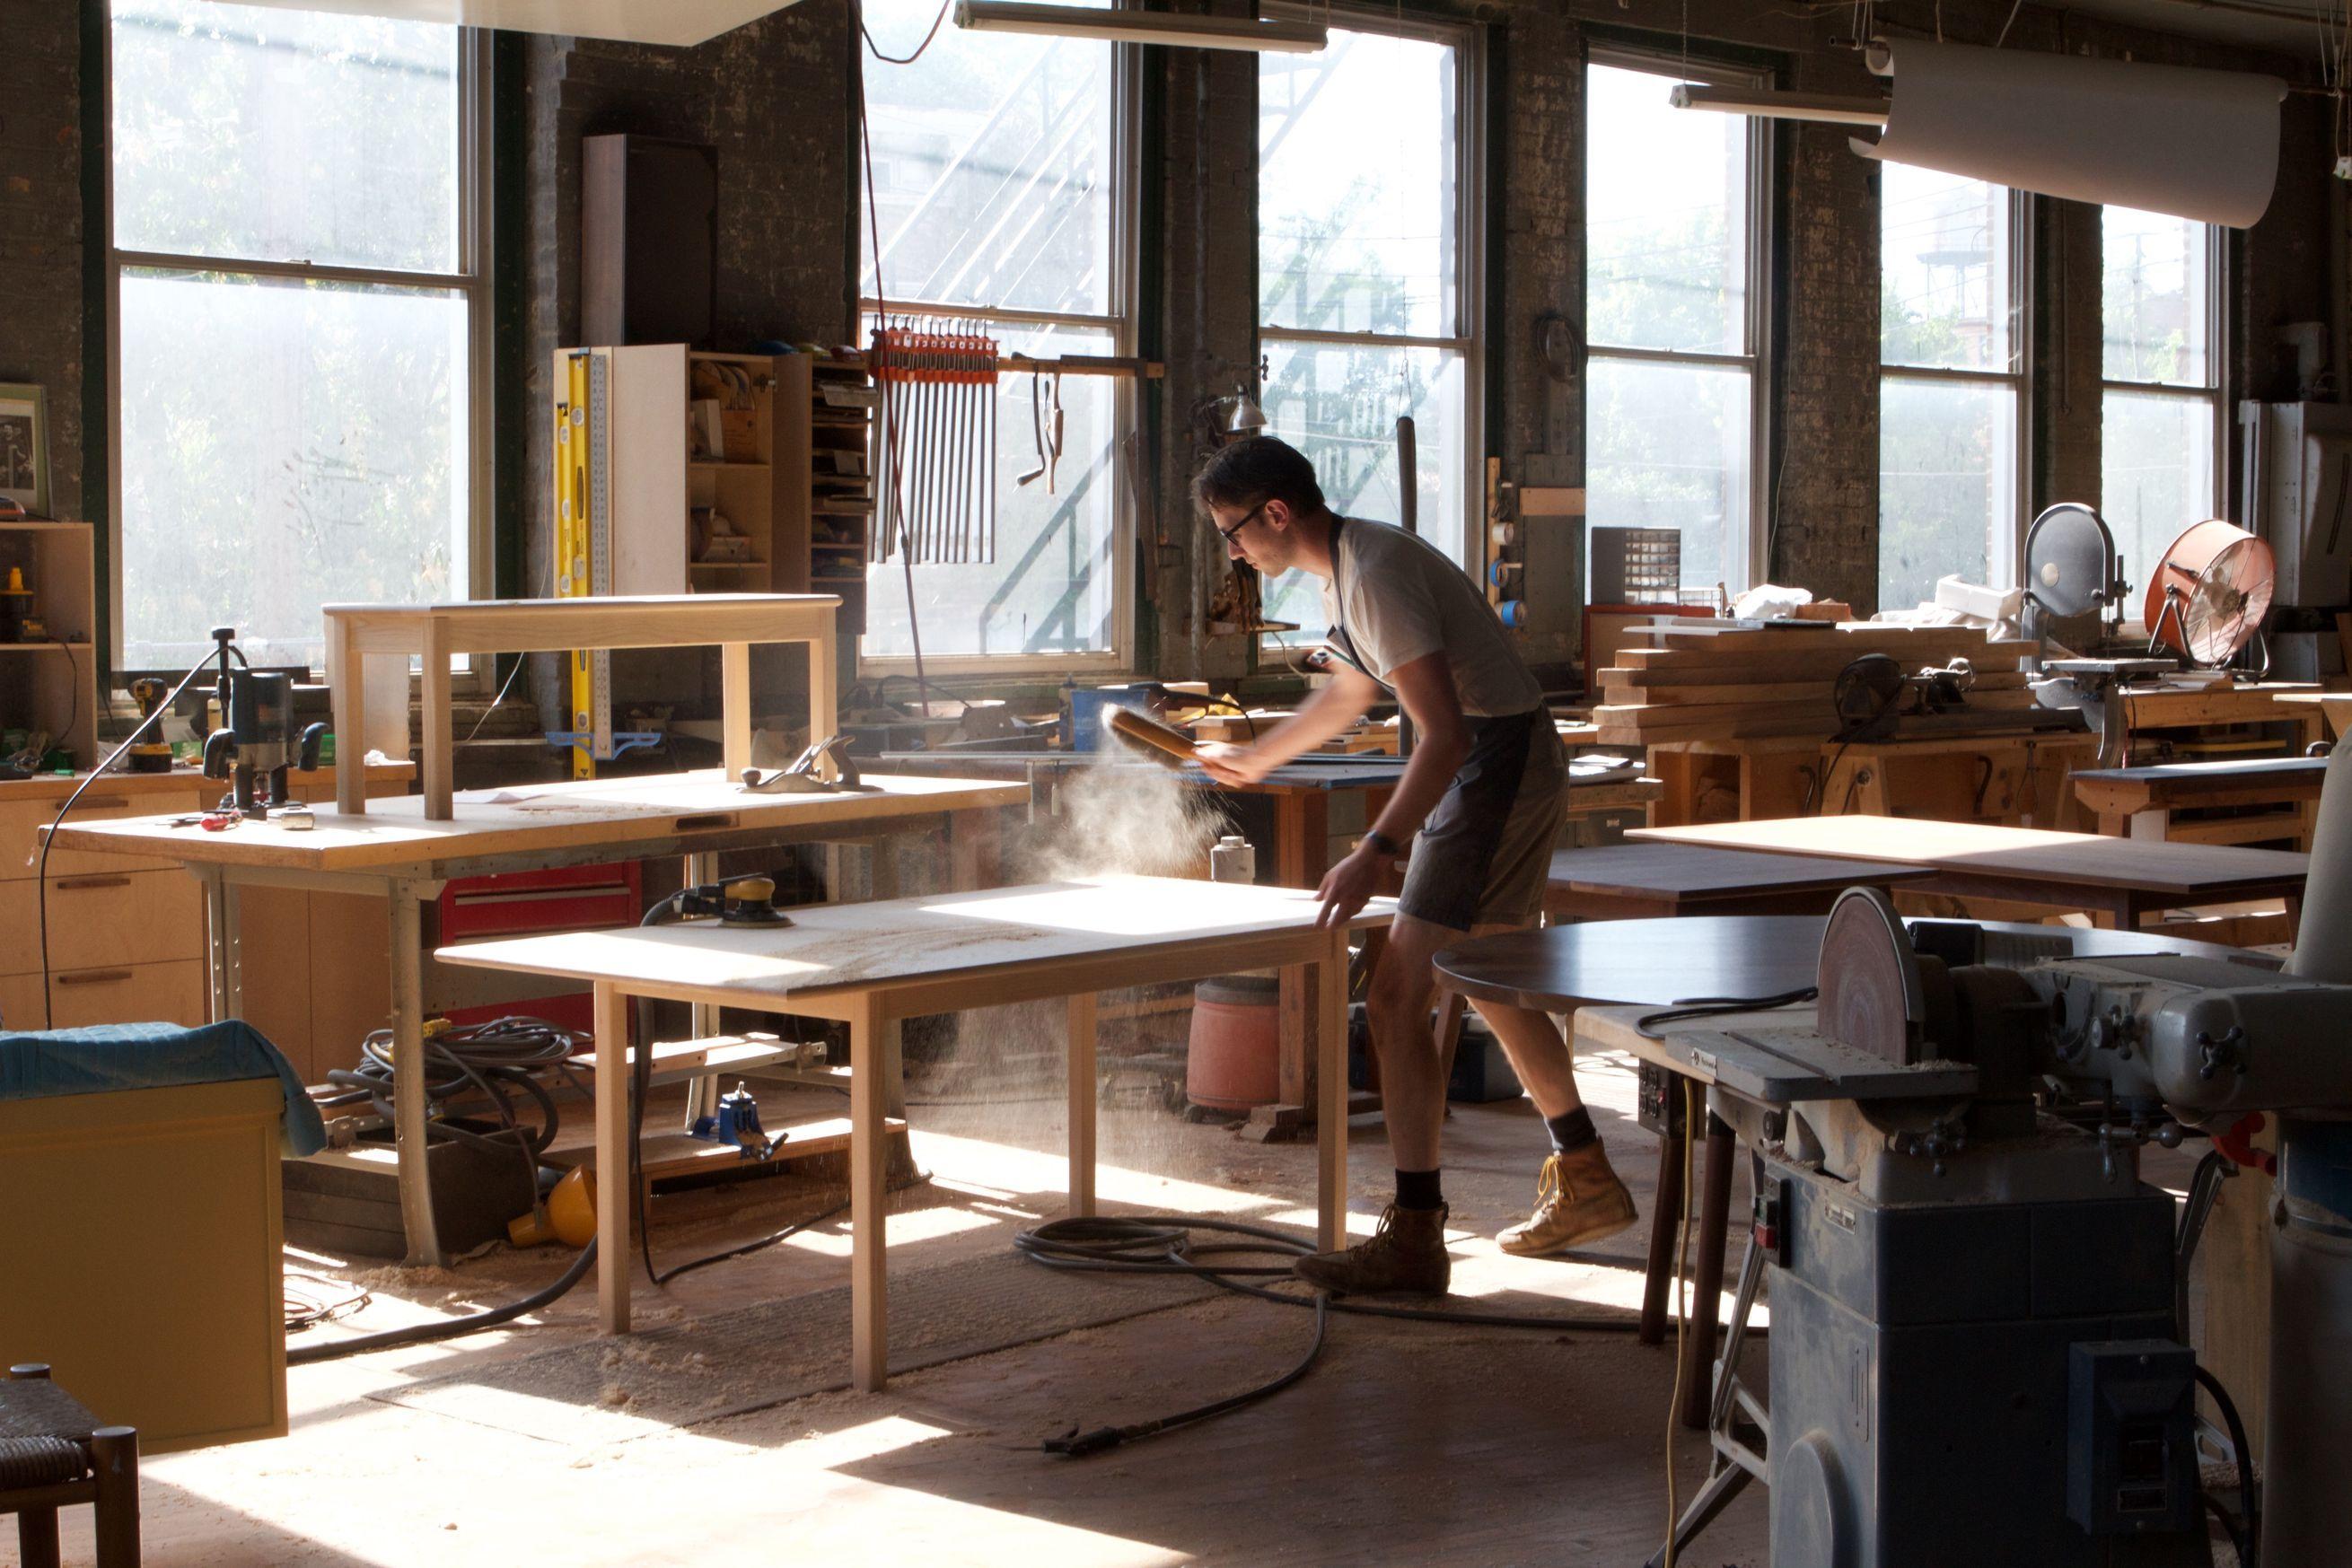 Why Itu0027s So Hard To Buy Inexpensive, High Quality Furniture